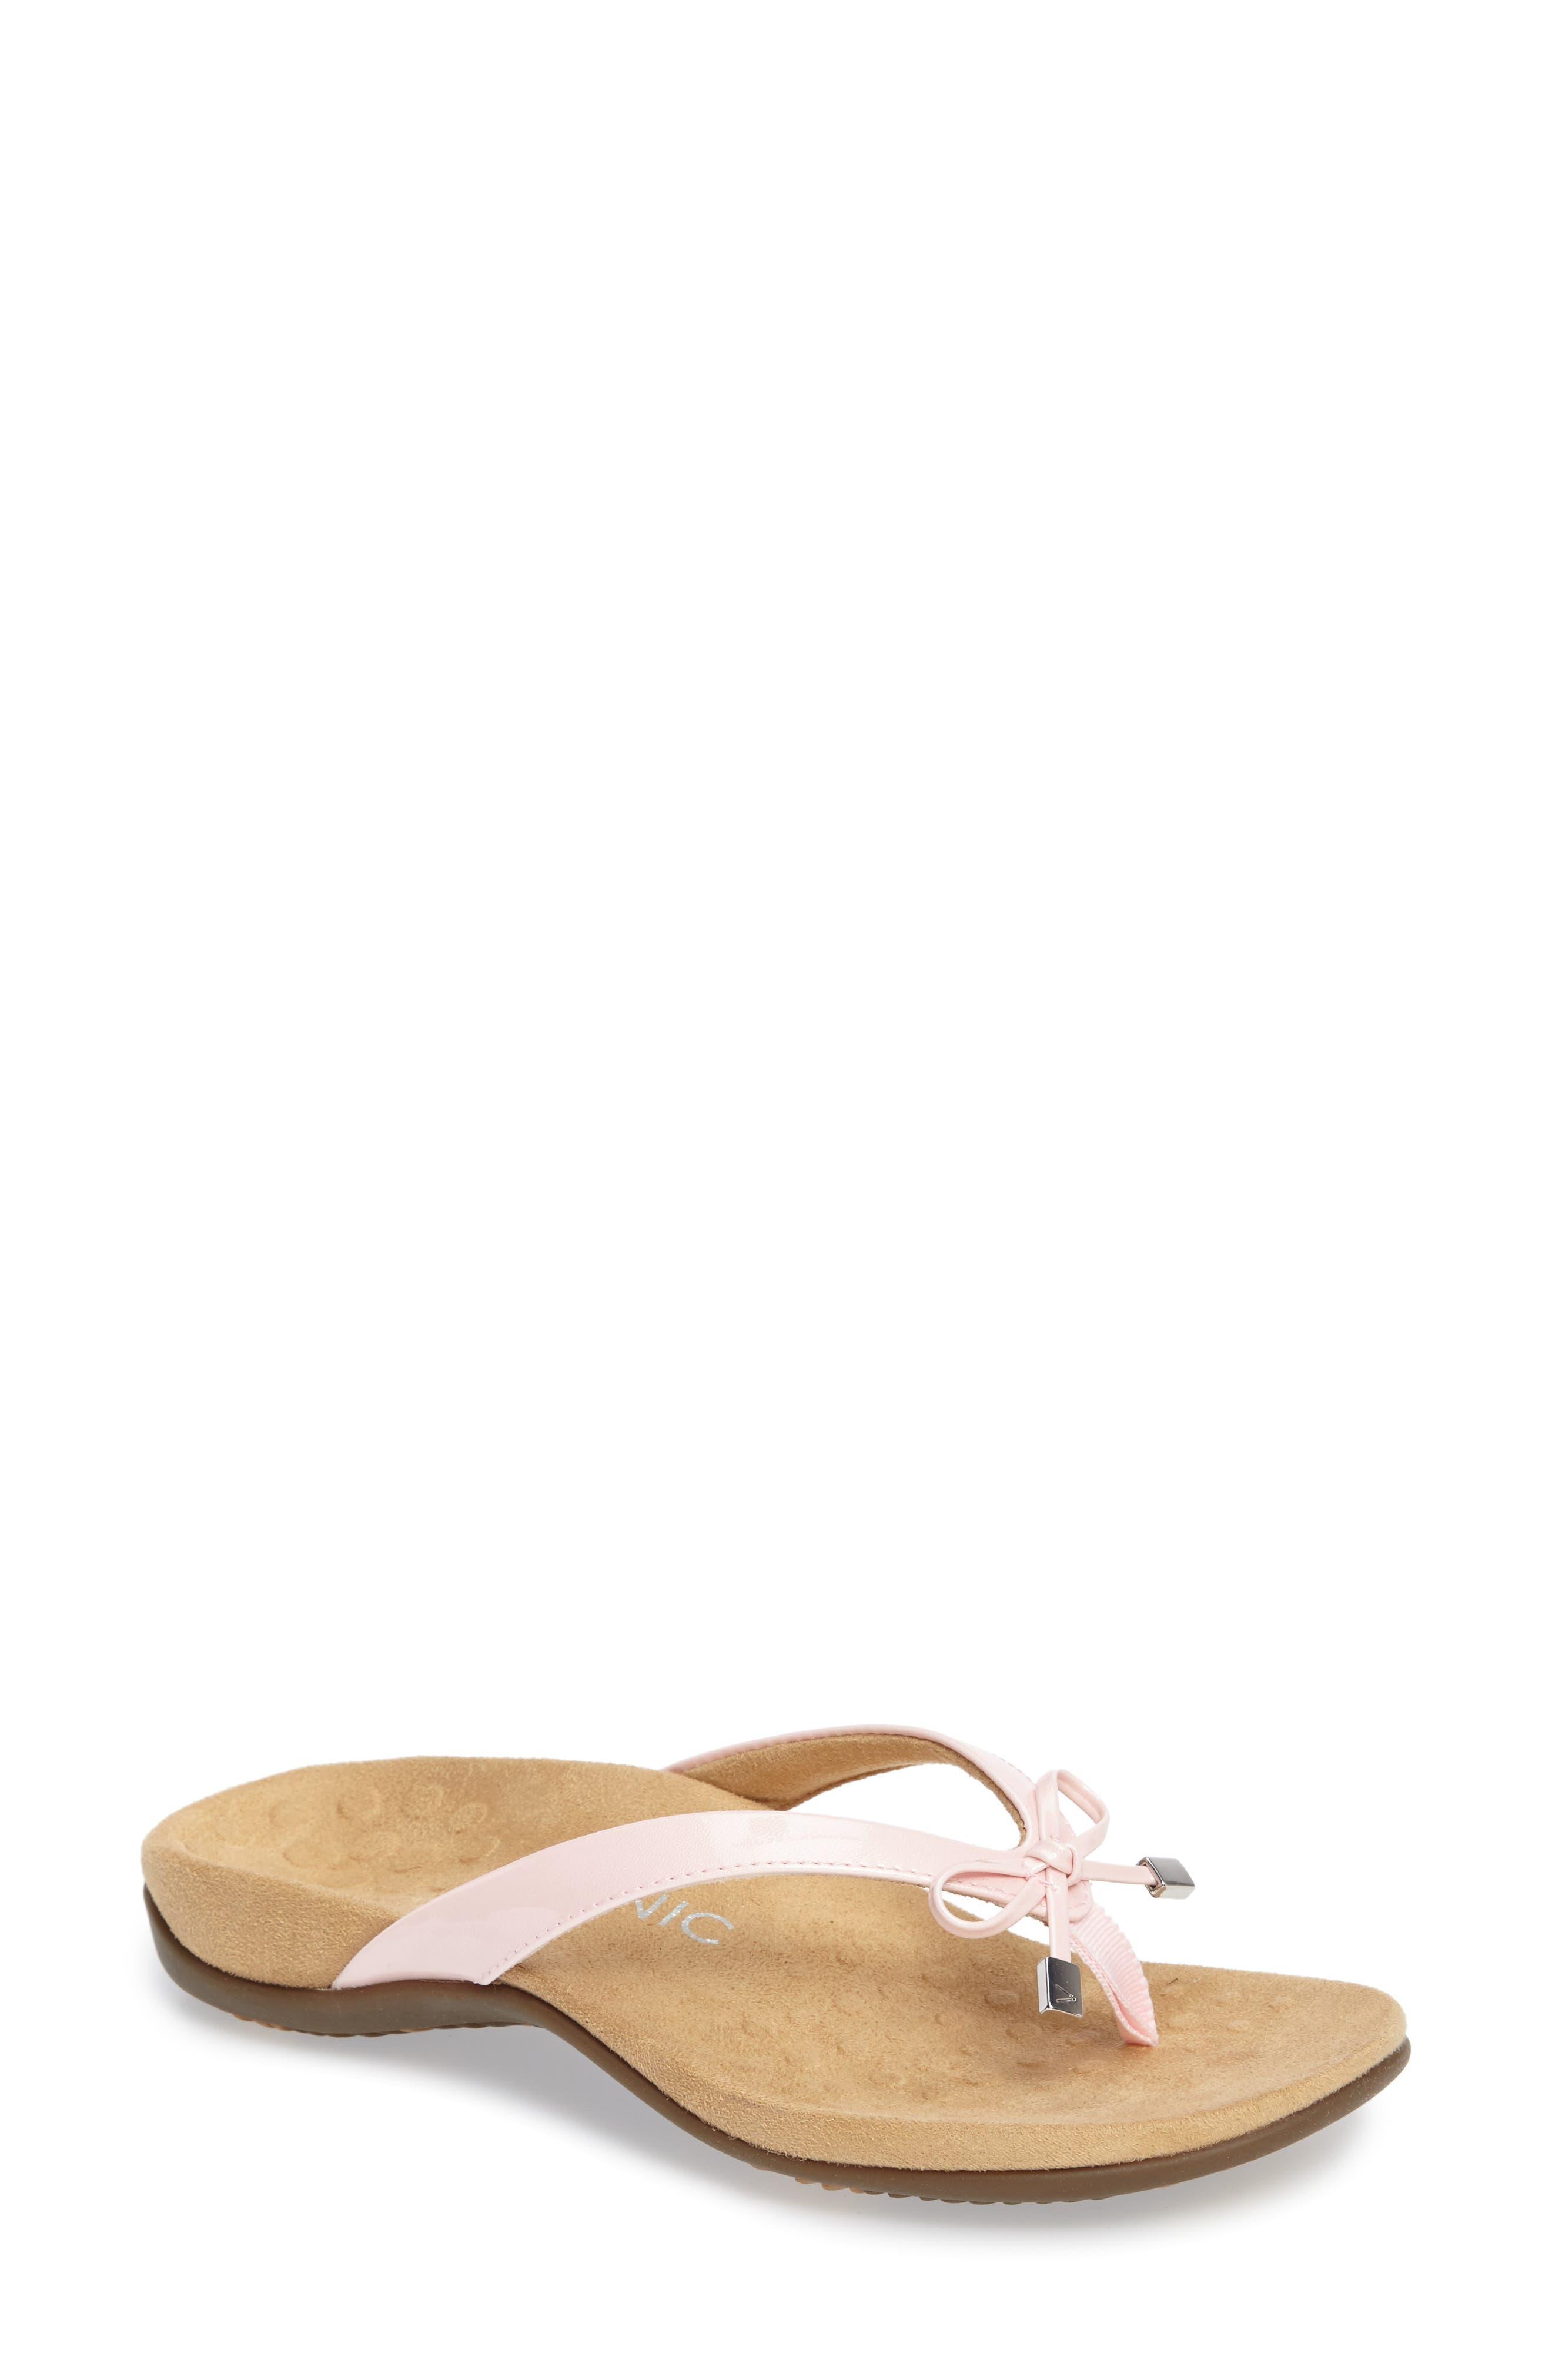 'Bella II' Sandal,                         Main,                         color, Pink Faux Leather